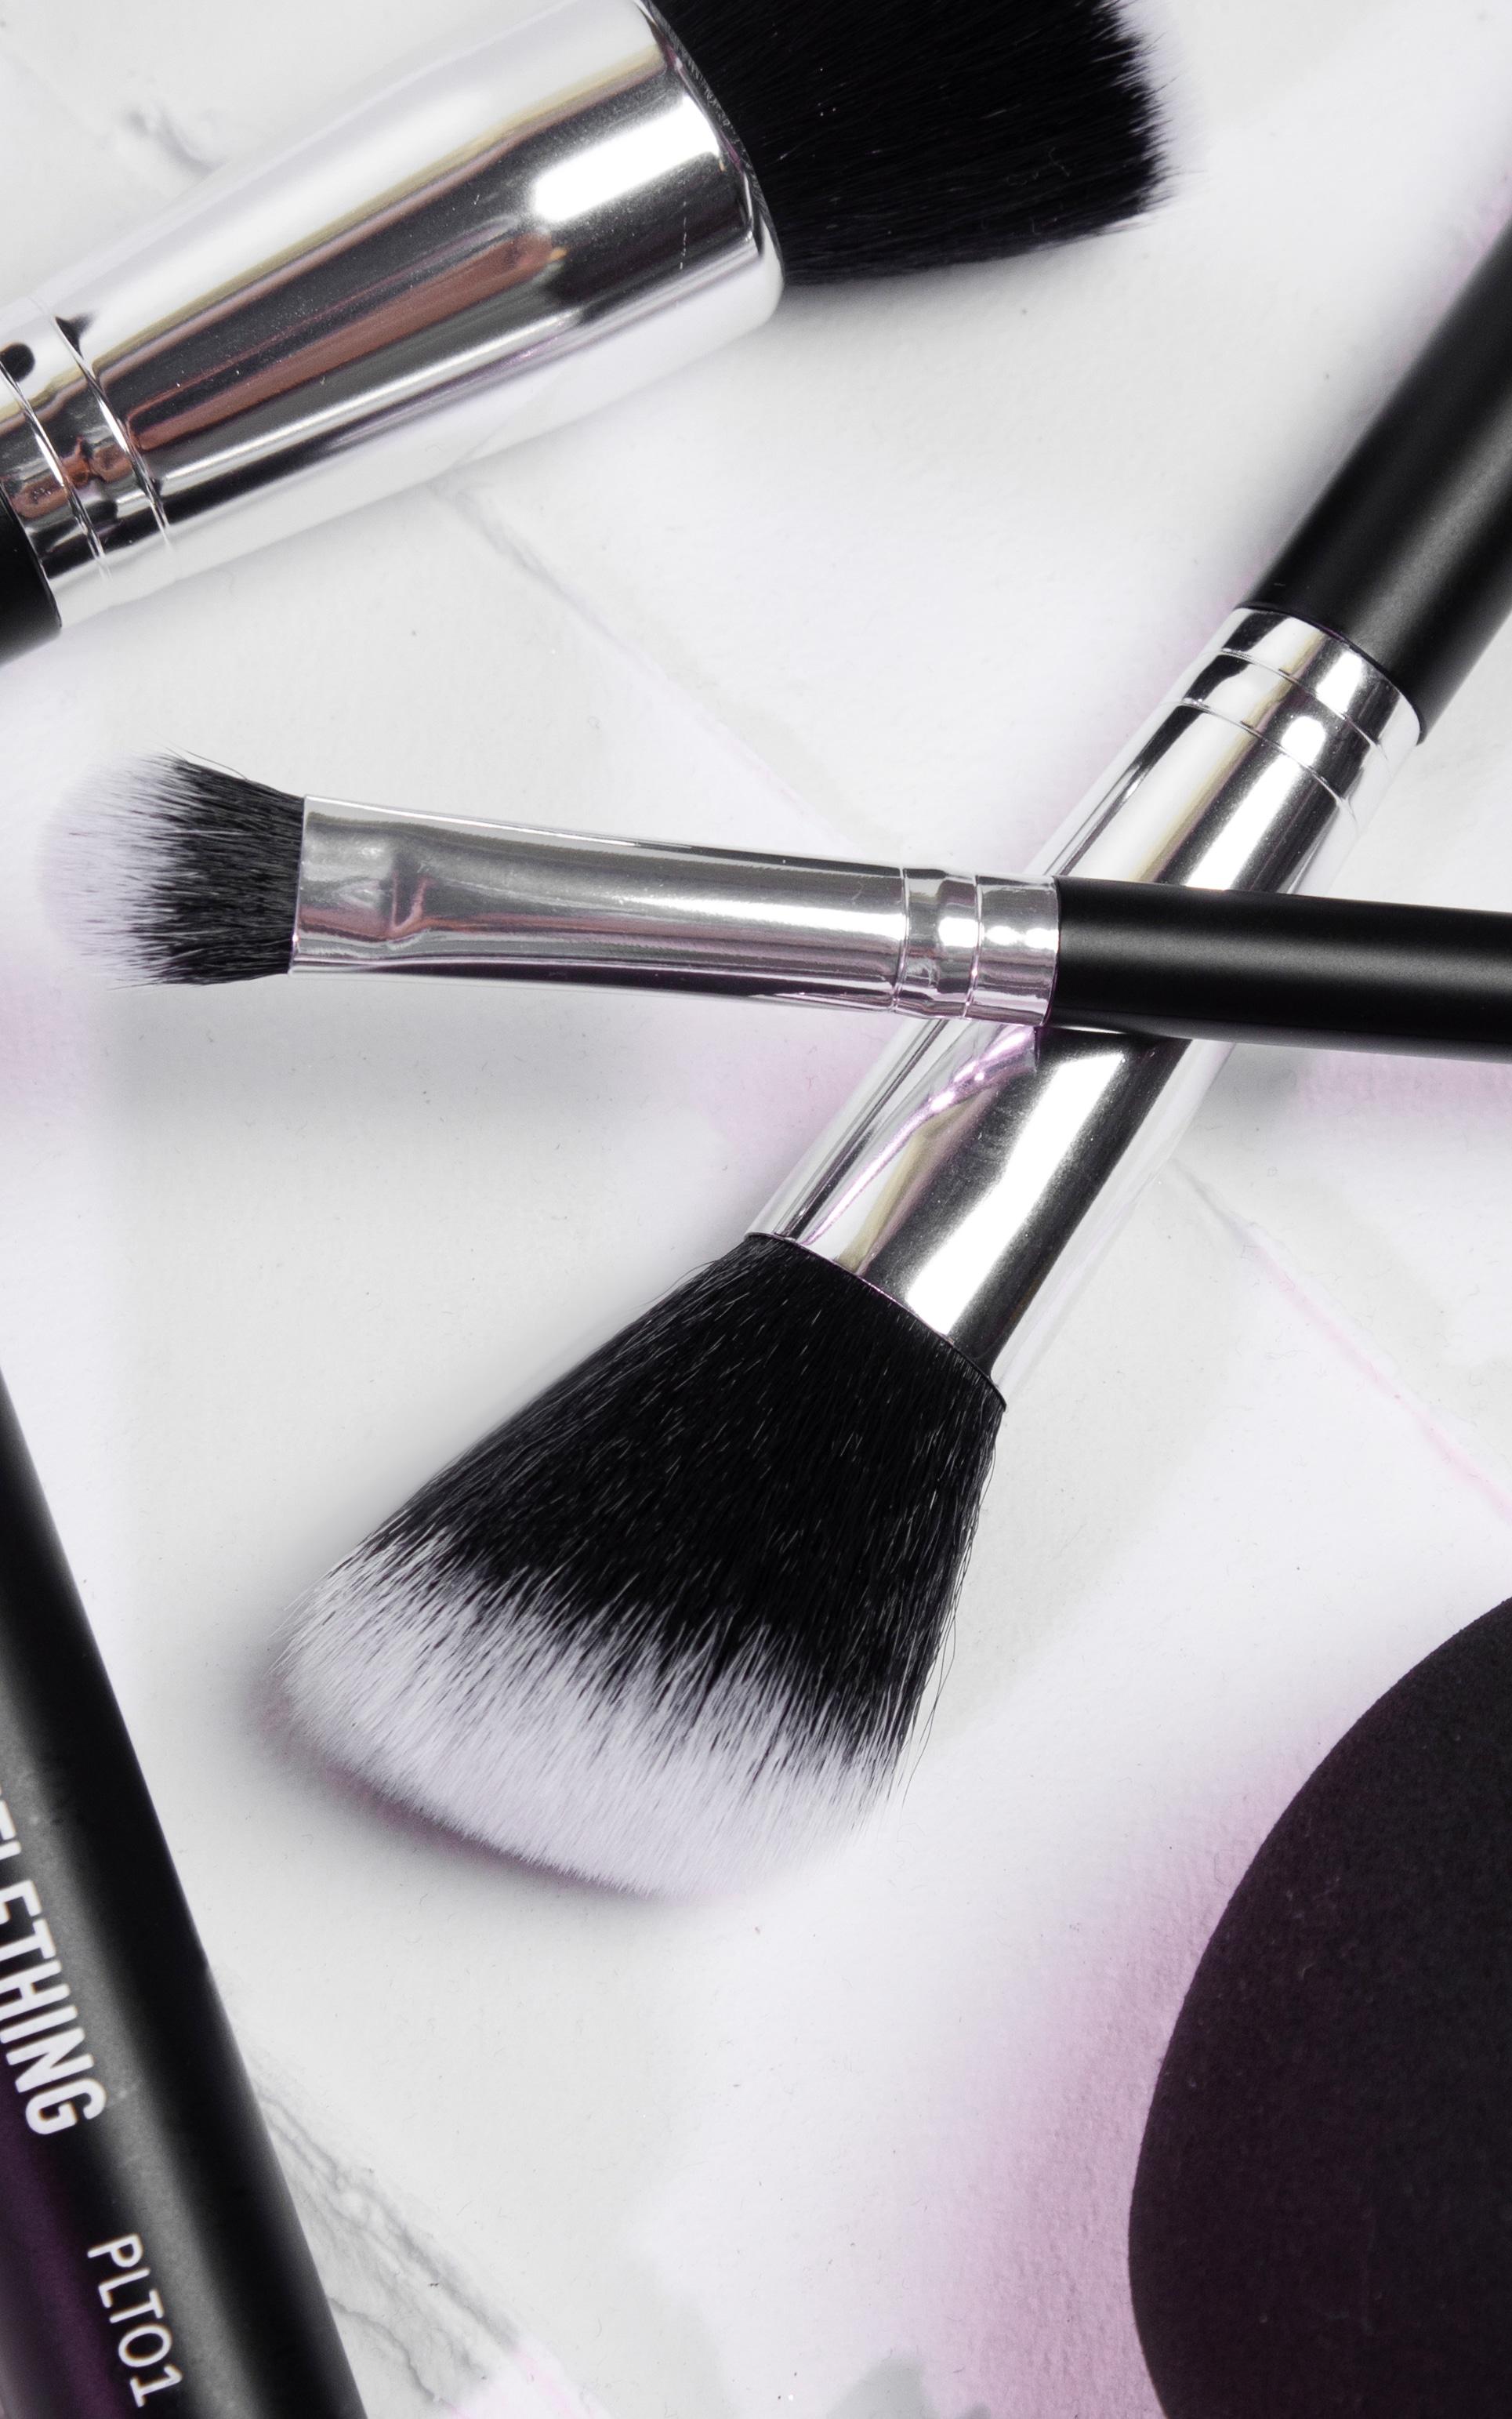 PRETTYLITTLETHING Angled Cheek Brush PLT04 4